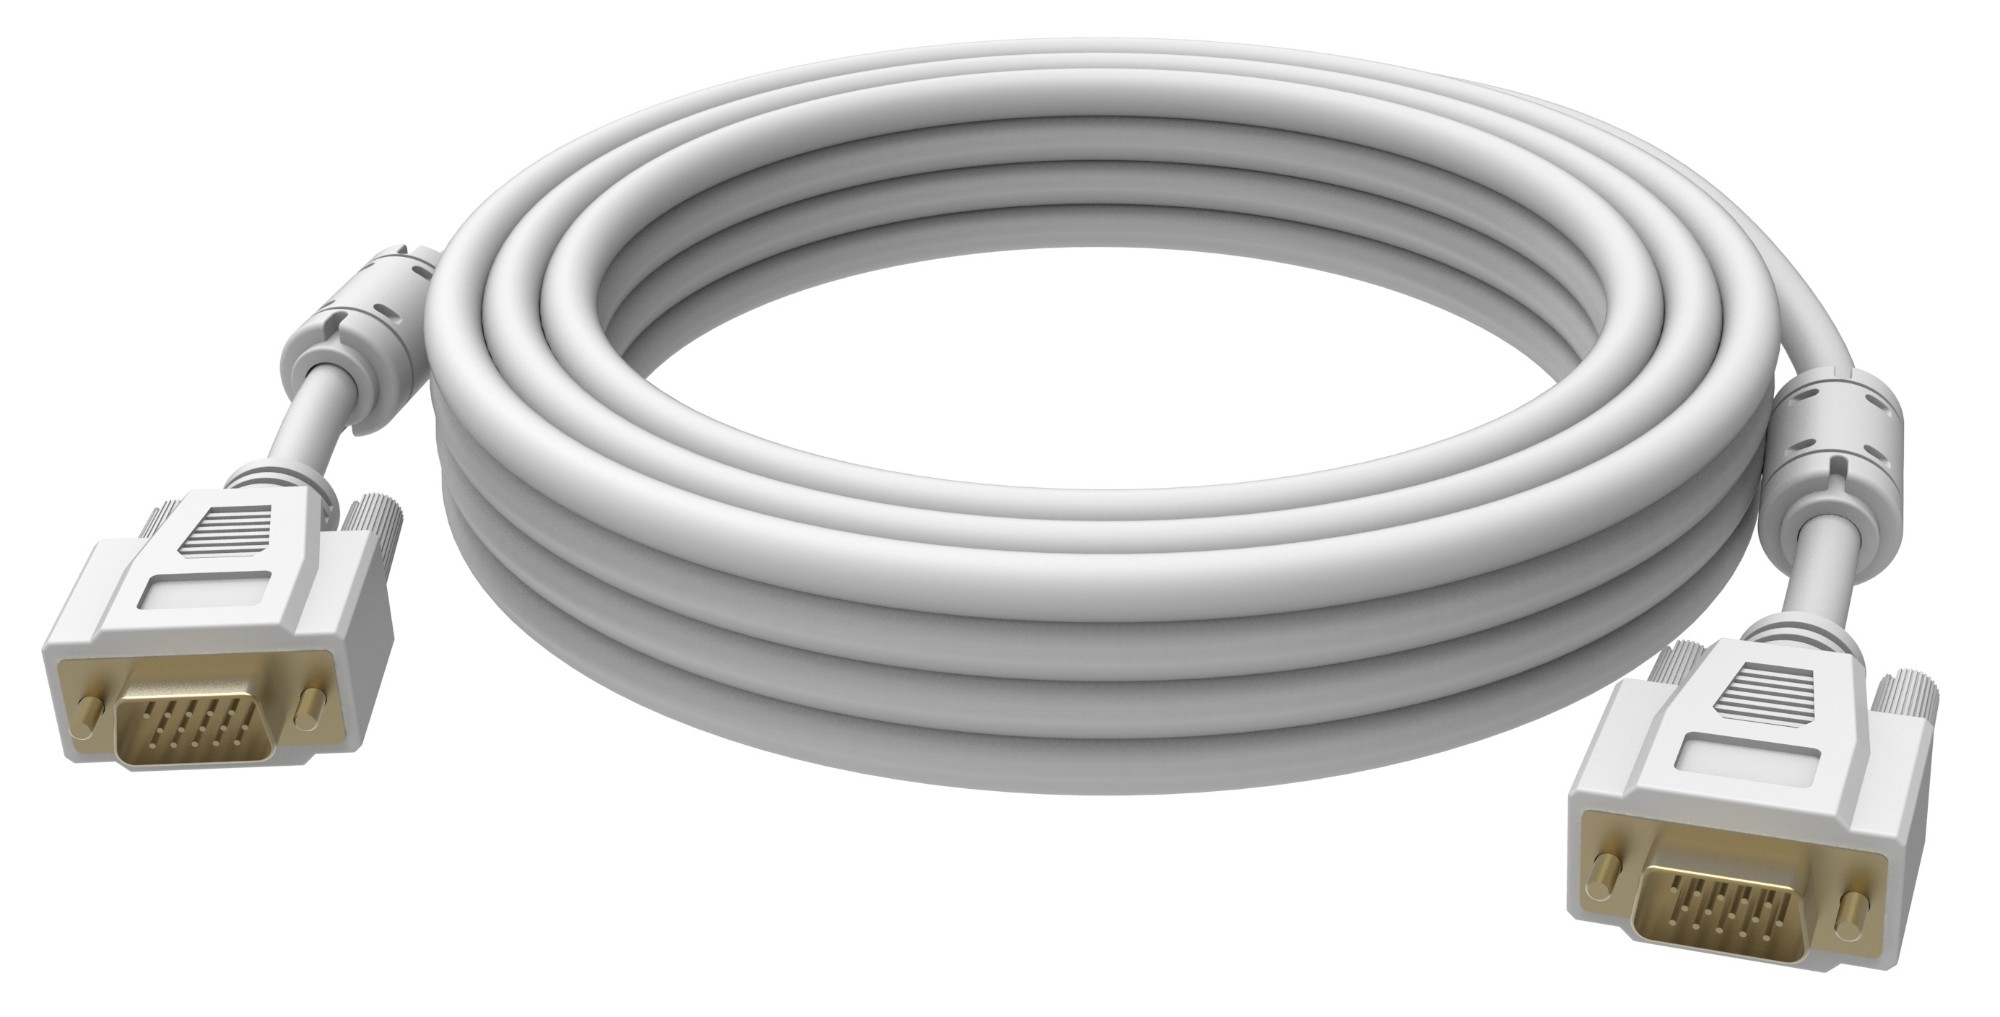 Vision 2x VGA 15-pin D-Sub, 10m cable VGA VGA (D-Sub) Blanco